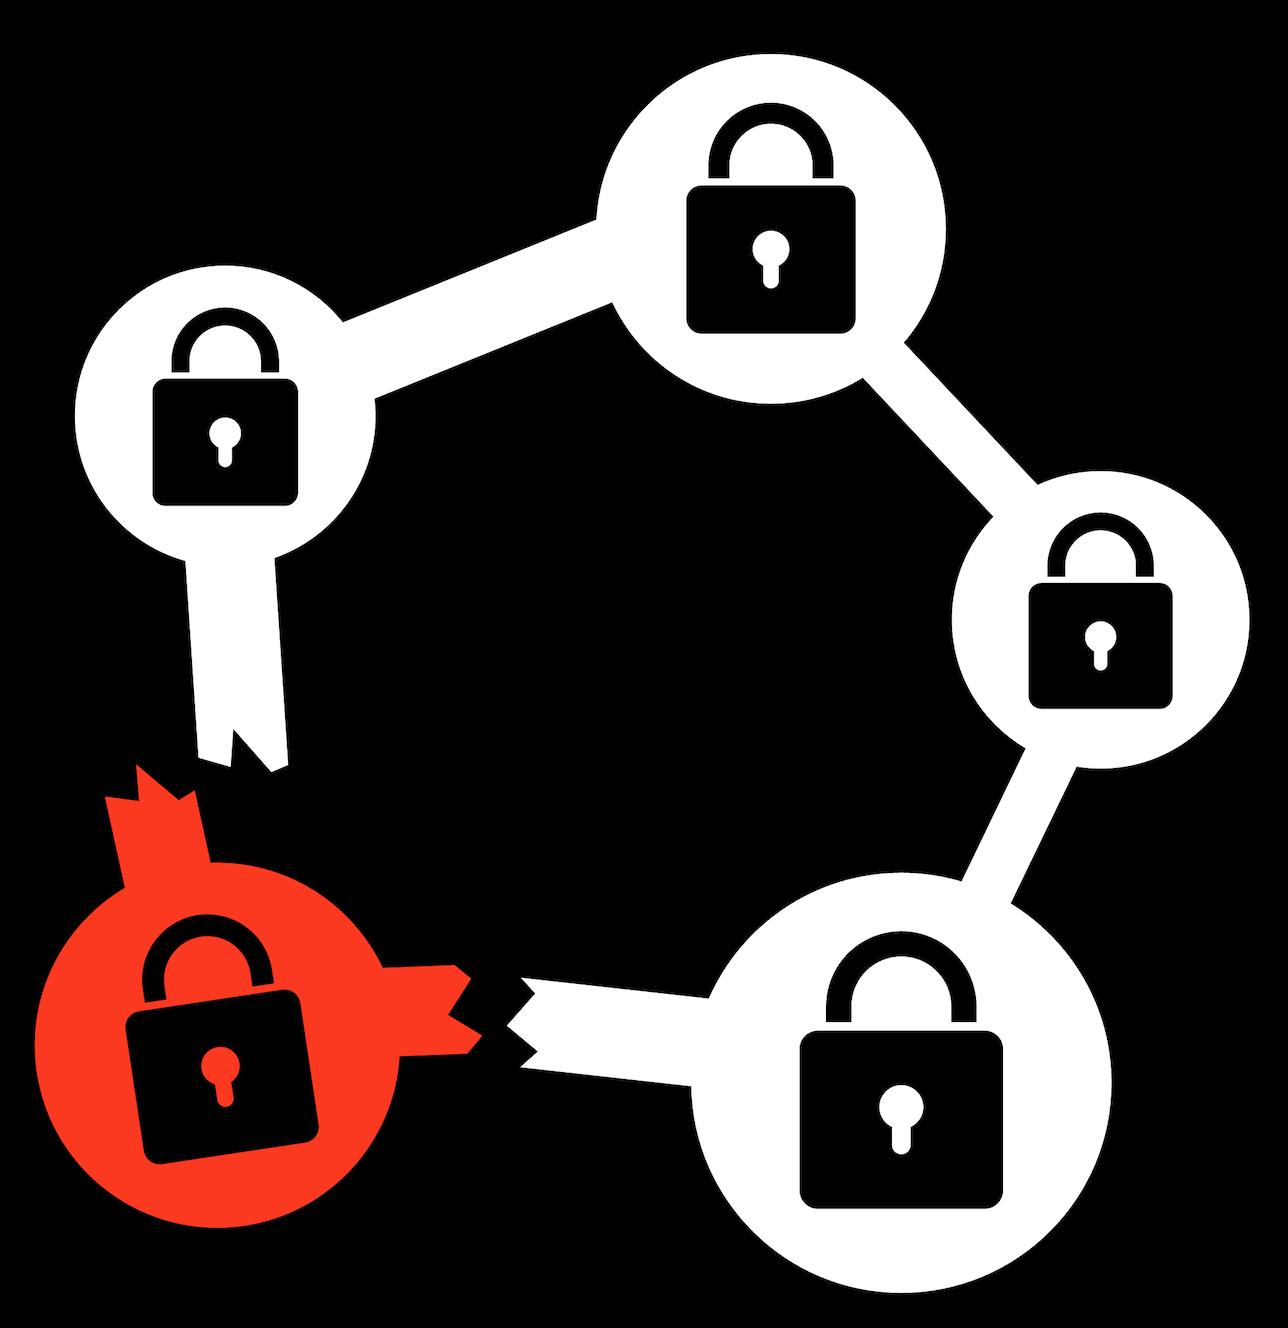 A broken blockchain link